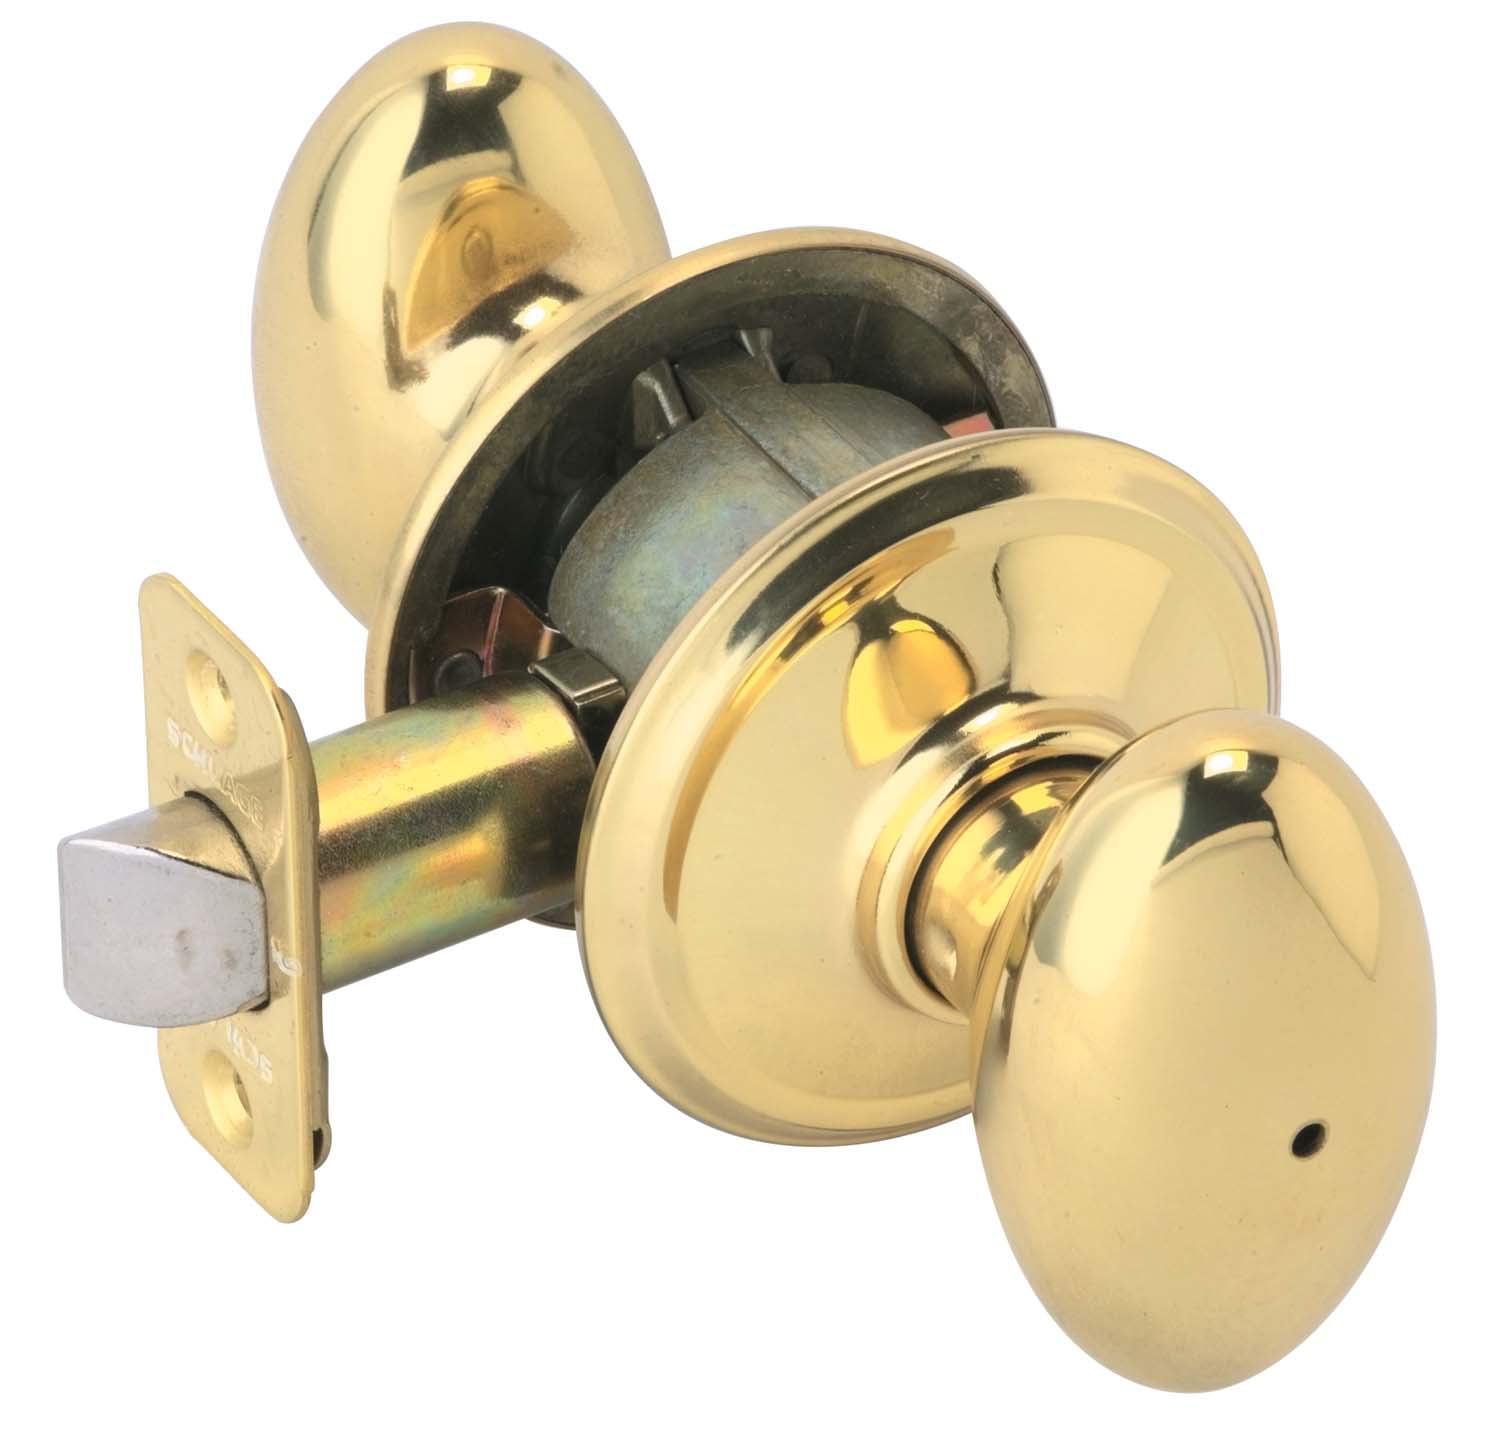 Schlage F40VSIE605 Bright Brass Siena Privacy Knob